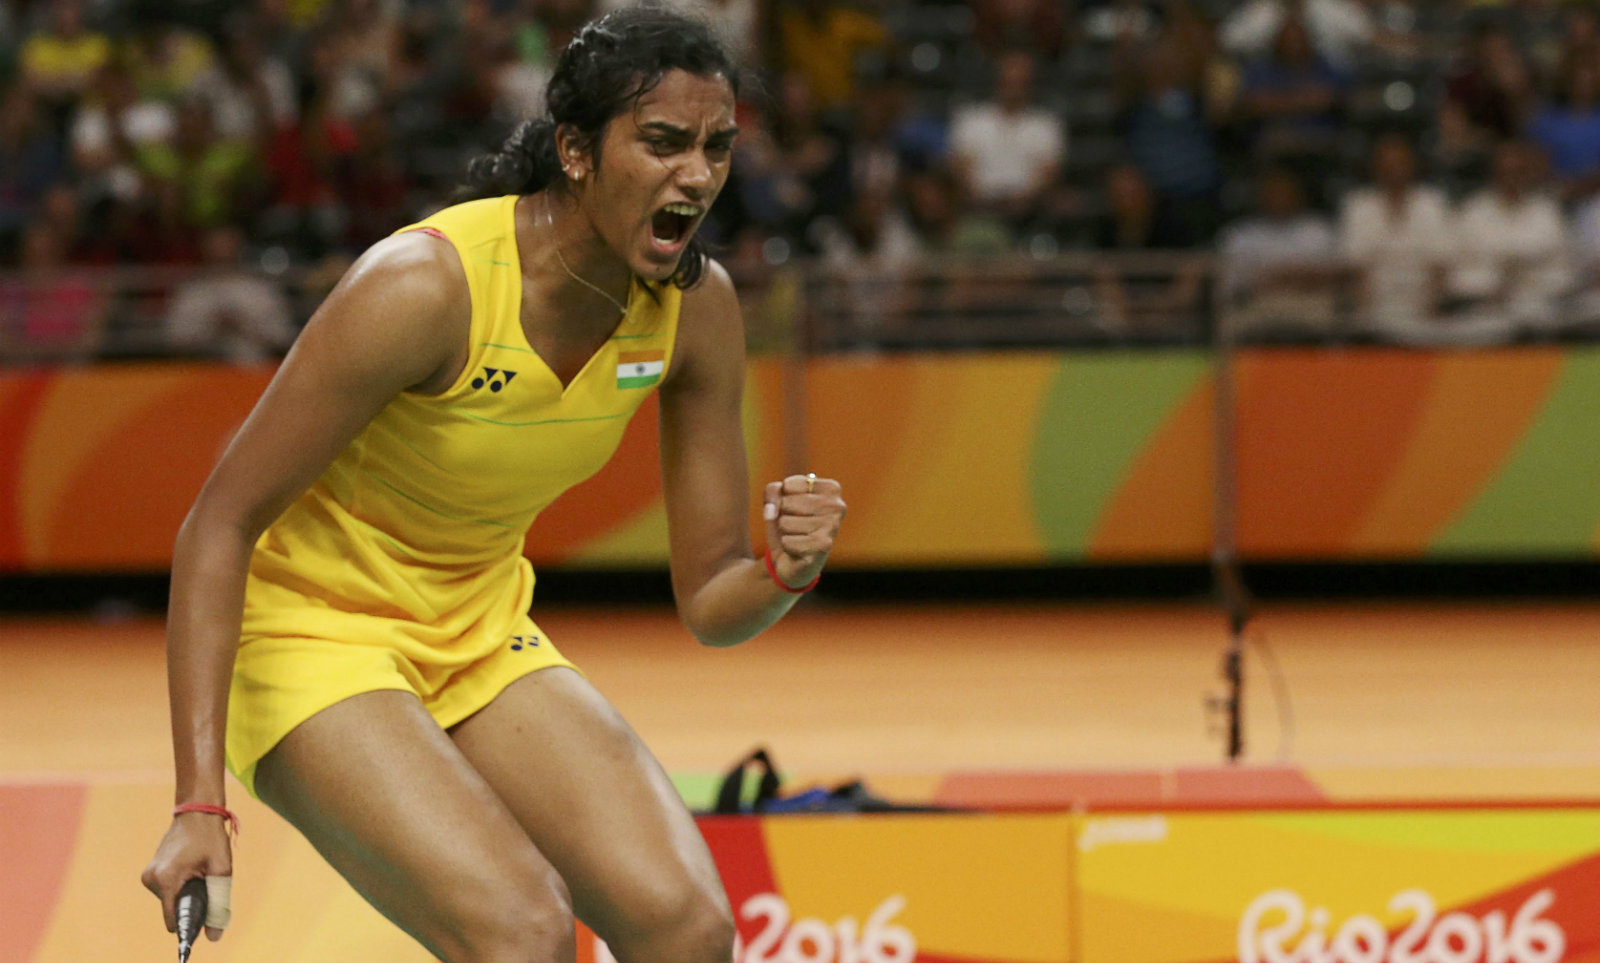 2016 Rio Olympics - Badminton - Women's Singles - Semifinals - Riocentro - Pavilion 4 - Rio de Janeiro, Brazil - 18/08/2016. P.V. Sindhu (IND) of India reacts during play against Nozomi Okuhara (JPN) of Japan.